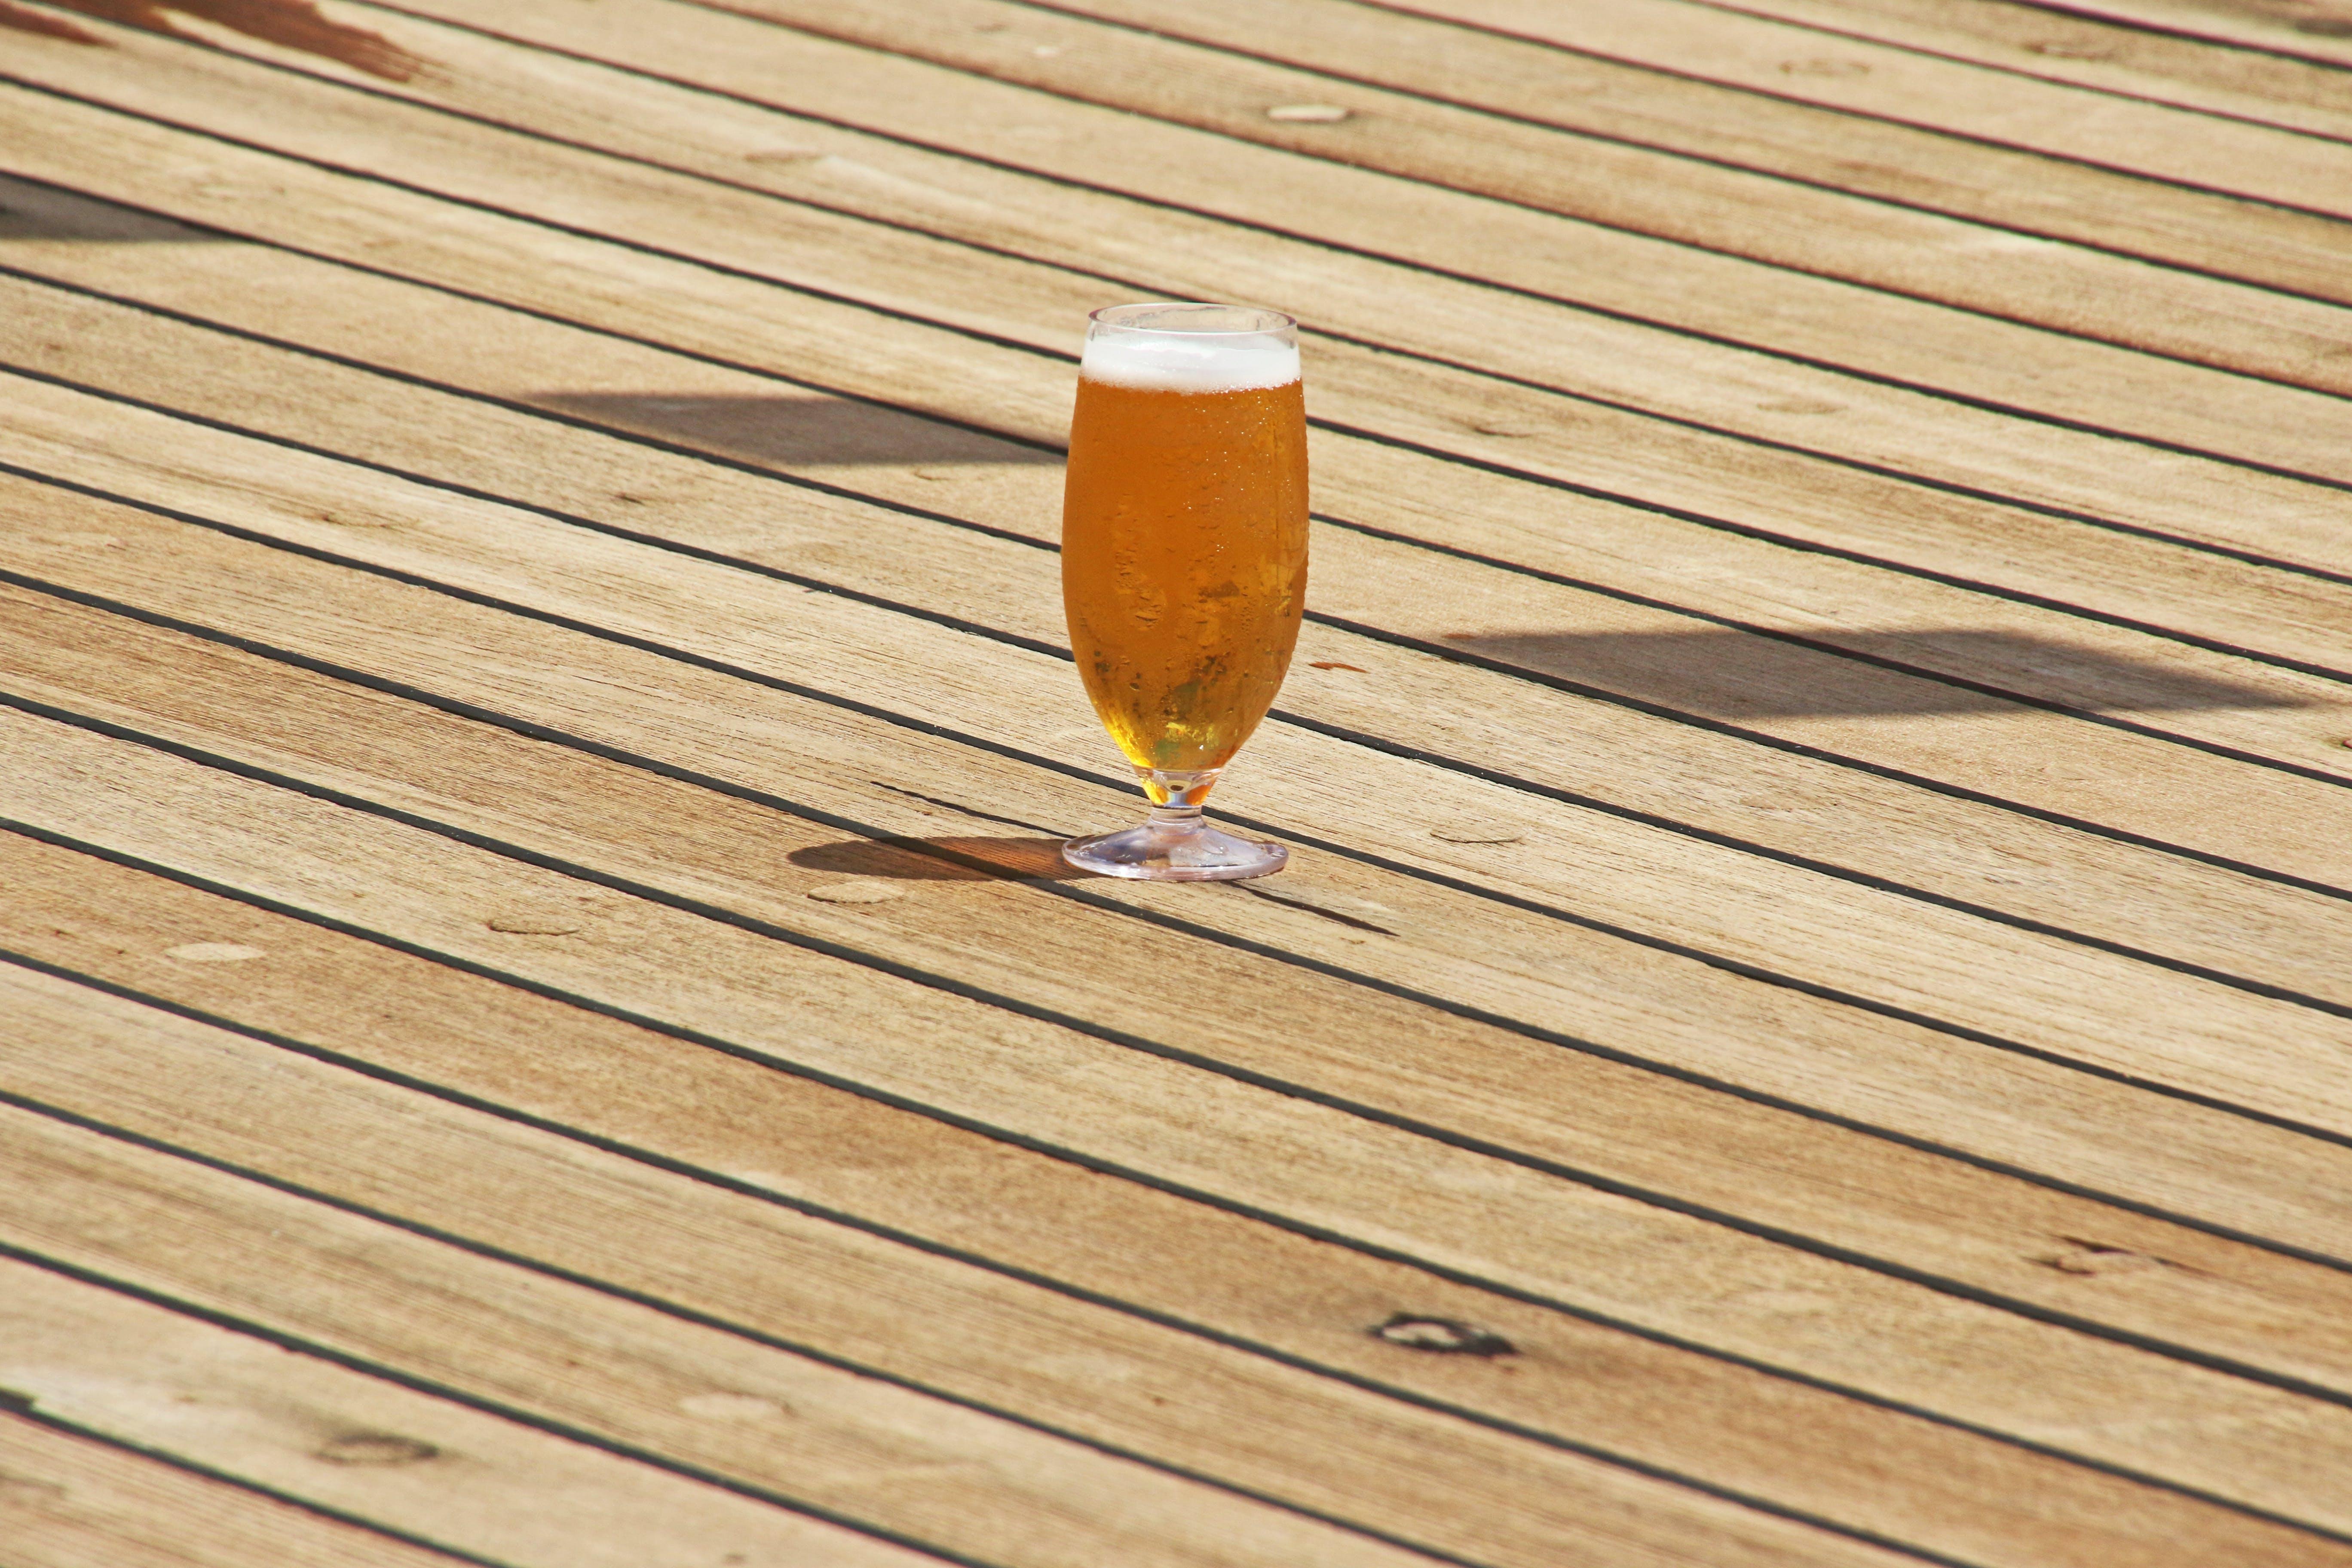 Clear Short-stem Wine Glass on Parquet Flooring